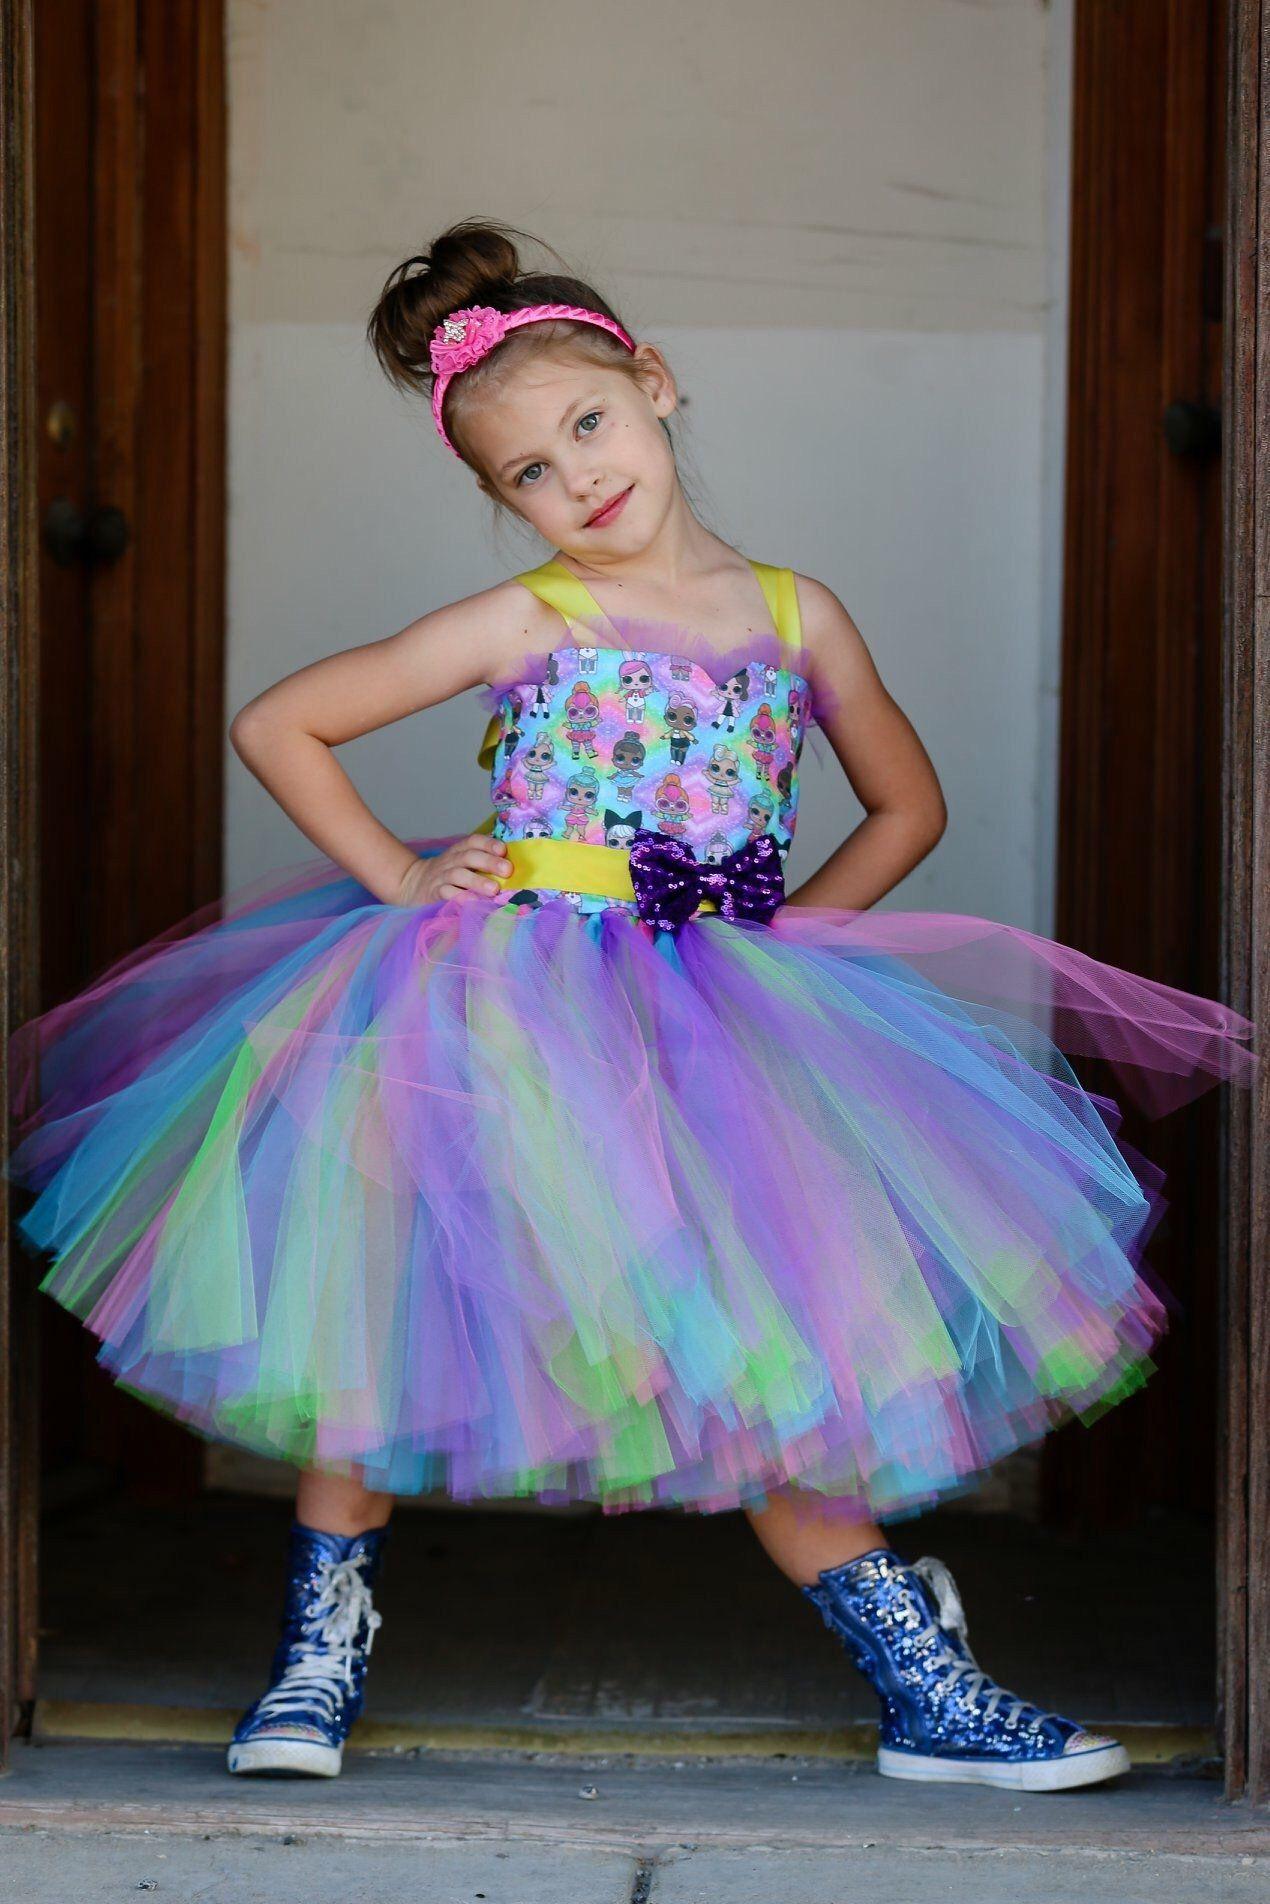 Lol surpise doll tutu lol tutu lol party dress lol